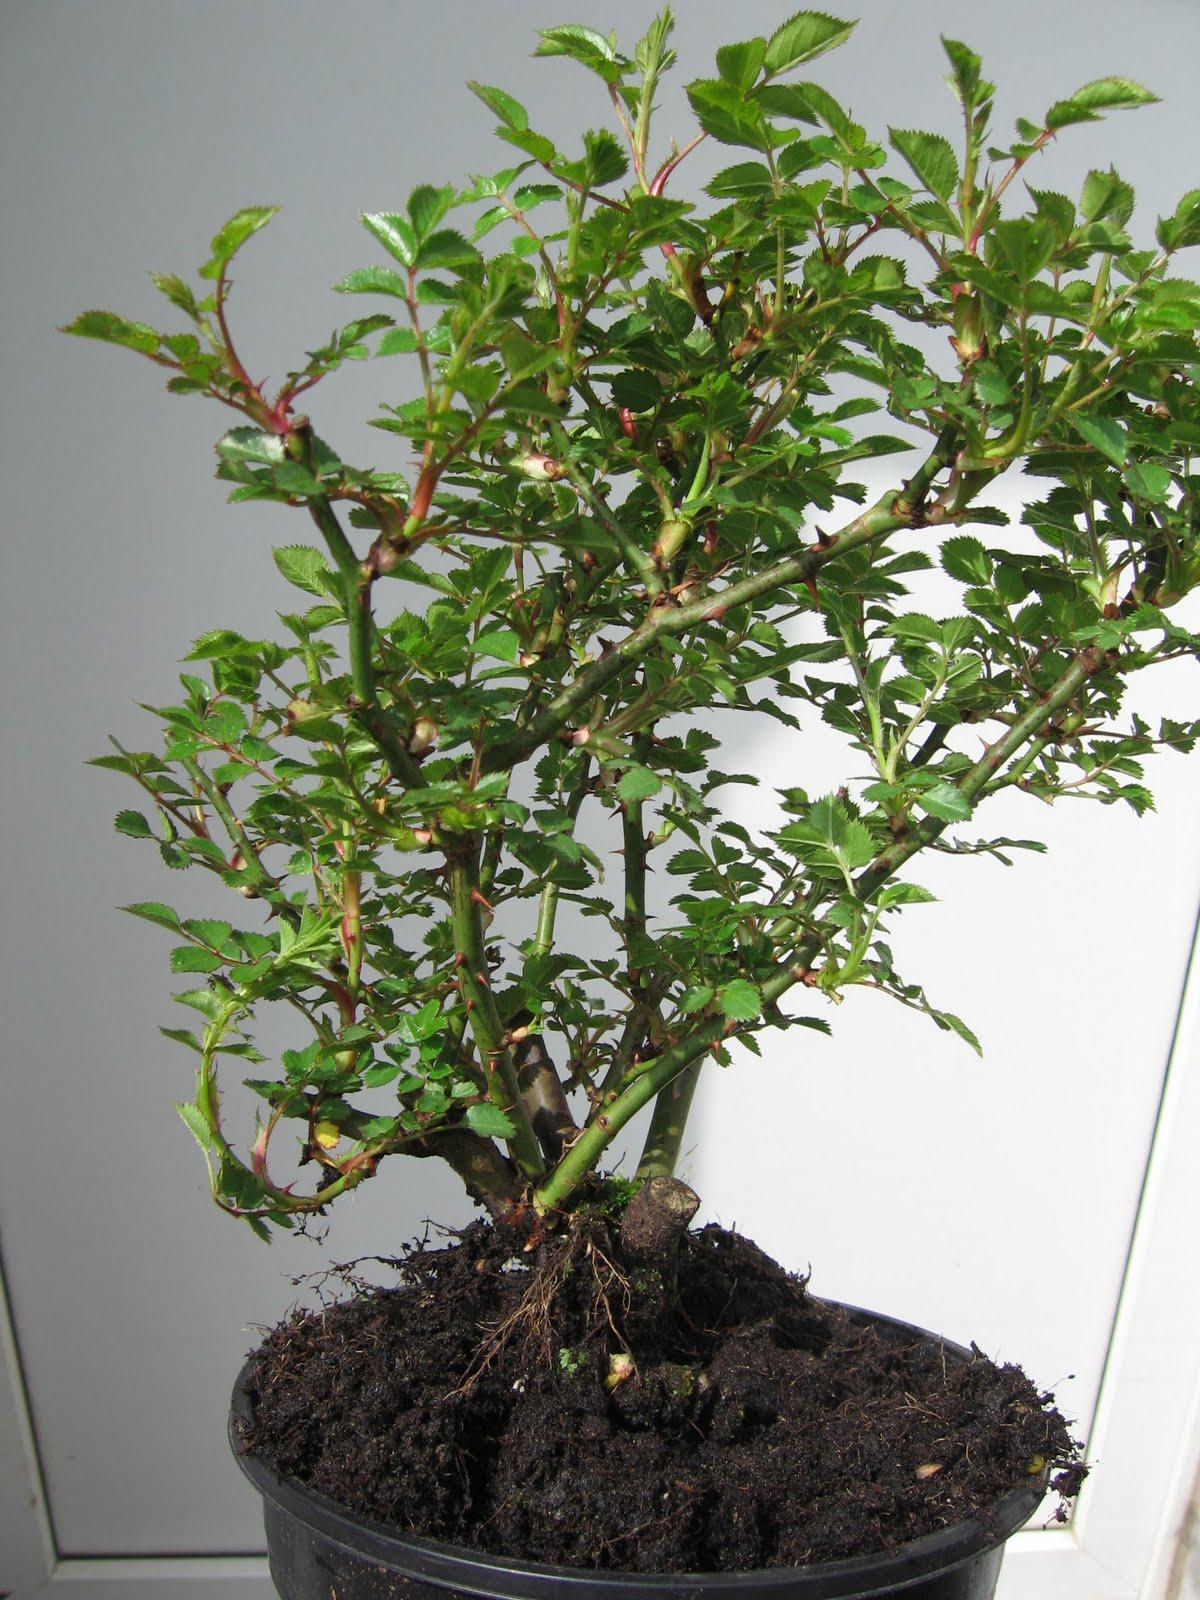 bonsai das sch nste hobby der welt zwergrose 39 lilliputs 39 als bonsai geeignet. Black Bedroom Furniture Sets. Home Design Ideas